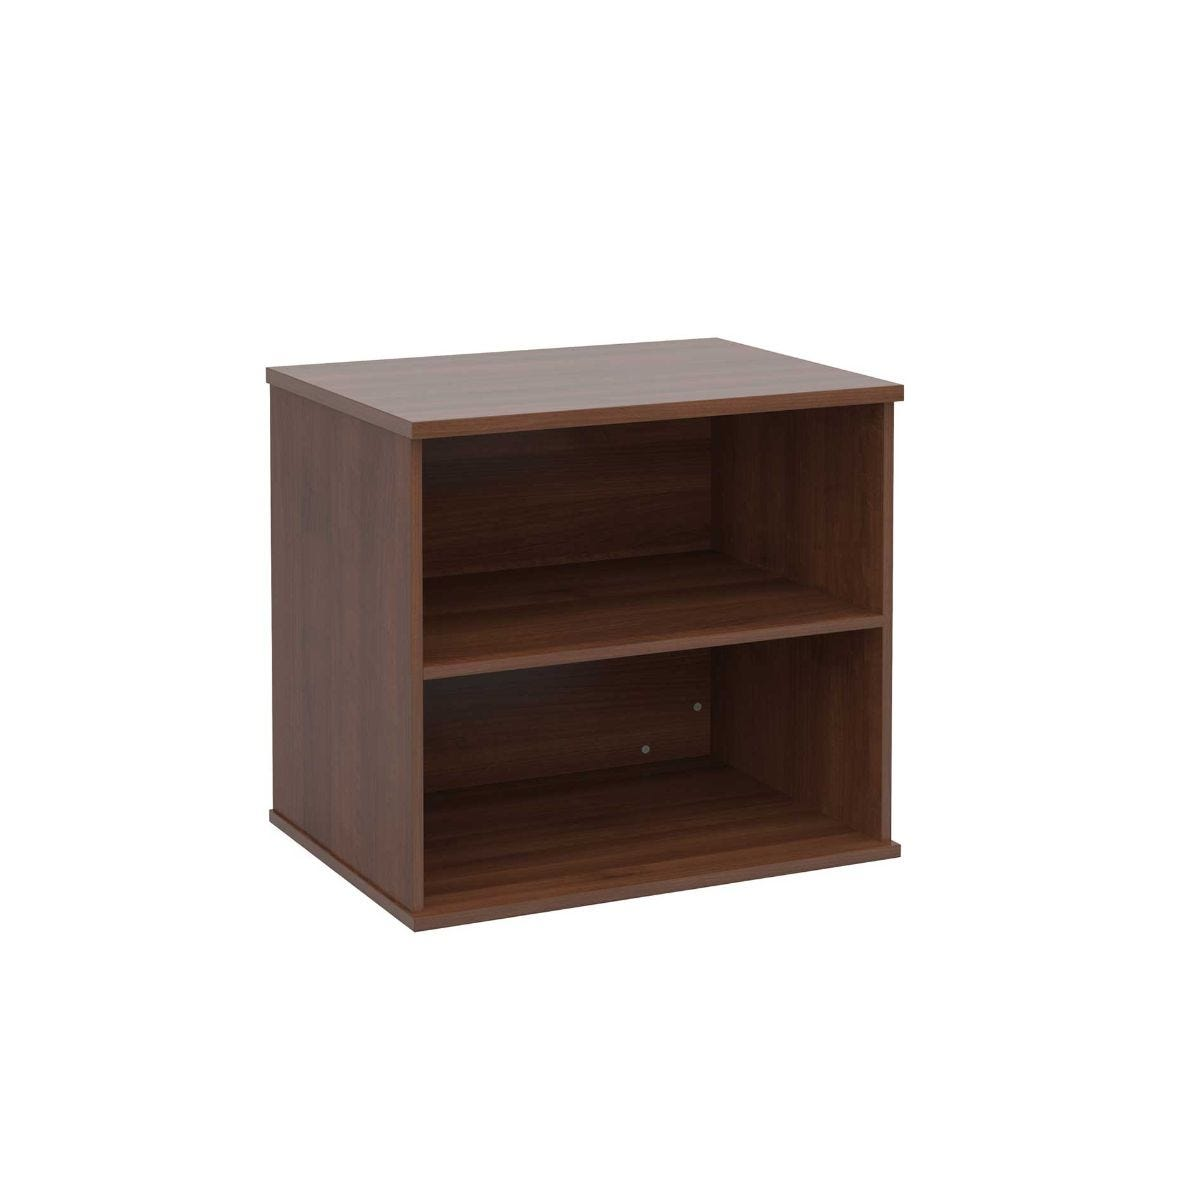 Desk High Bookcase with 1 Shelf, Walnut